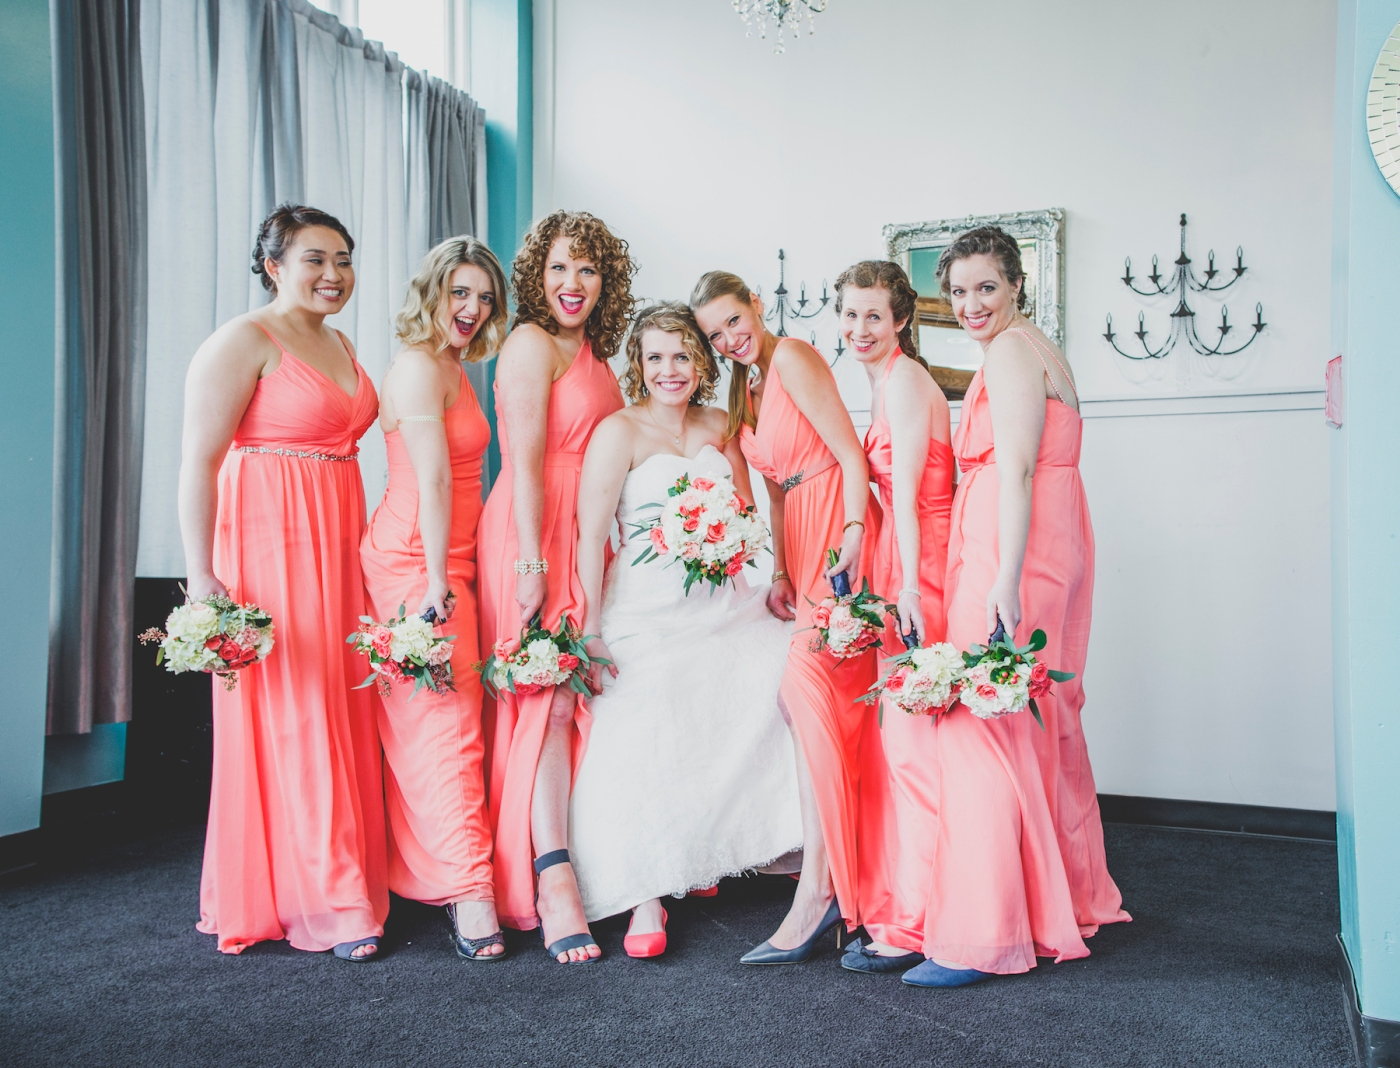 DSC_2452Everett_Wedding_Ballroom_Jane_Speleers_photography_Rachel_and_Edmund_Praying_2017